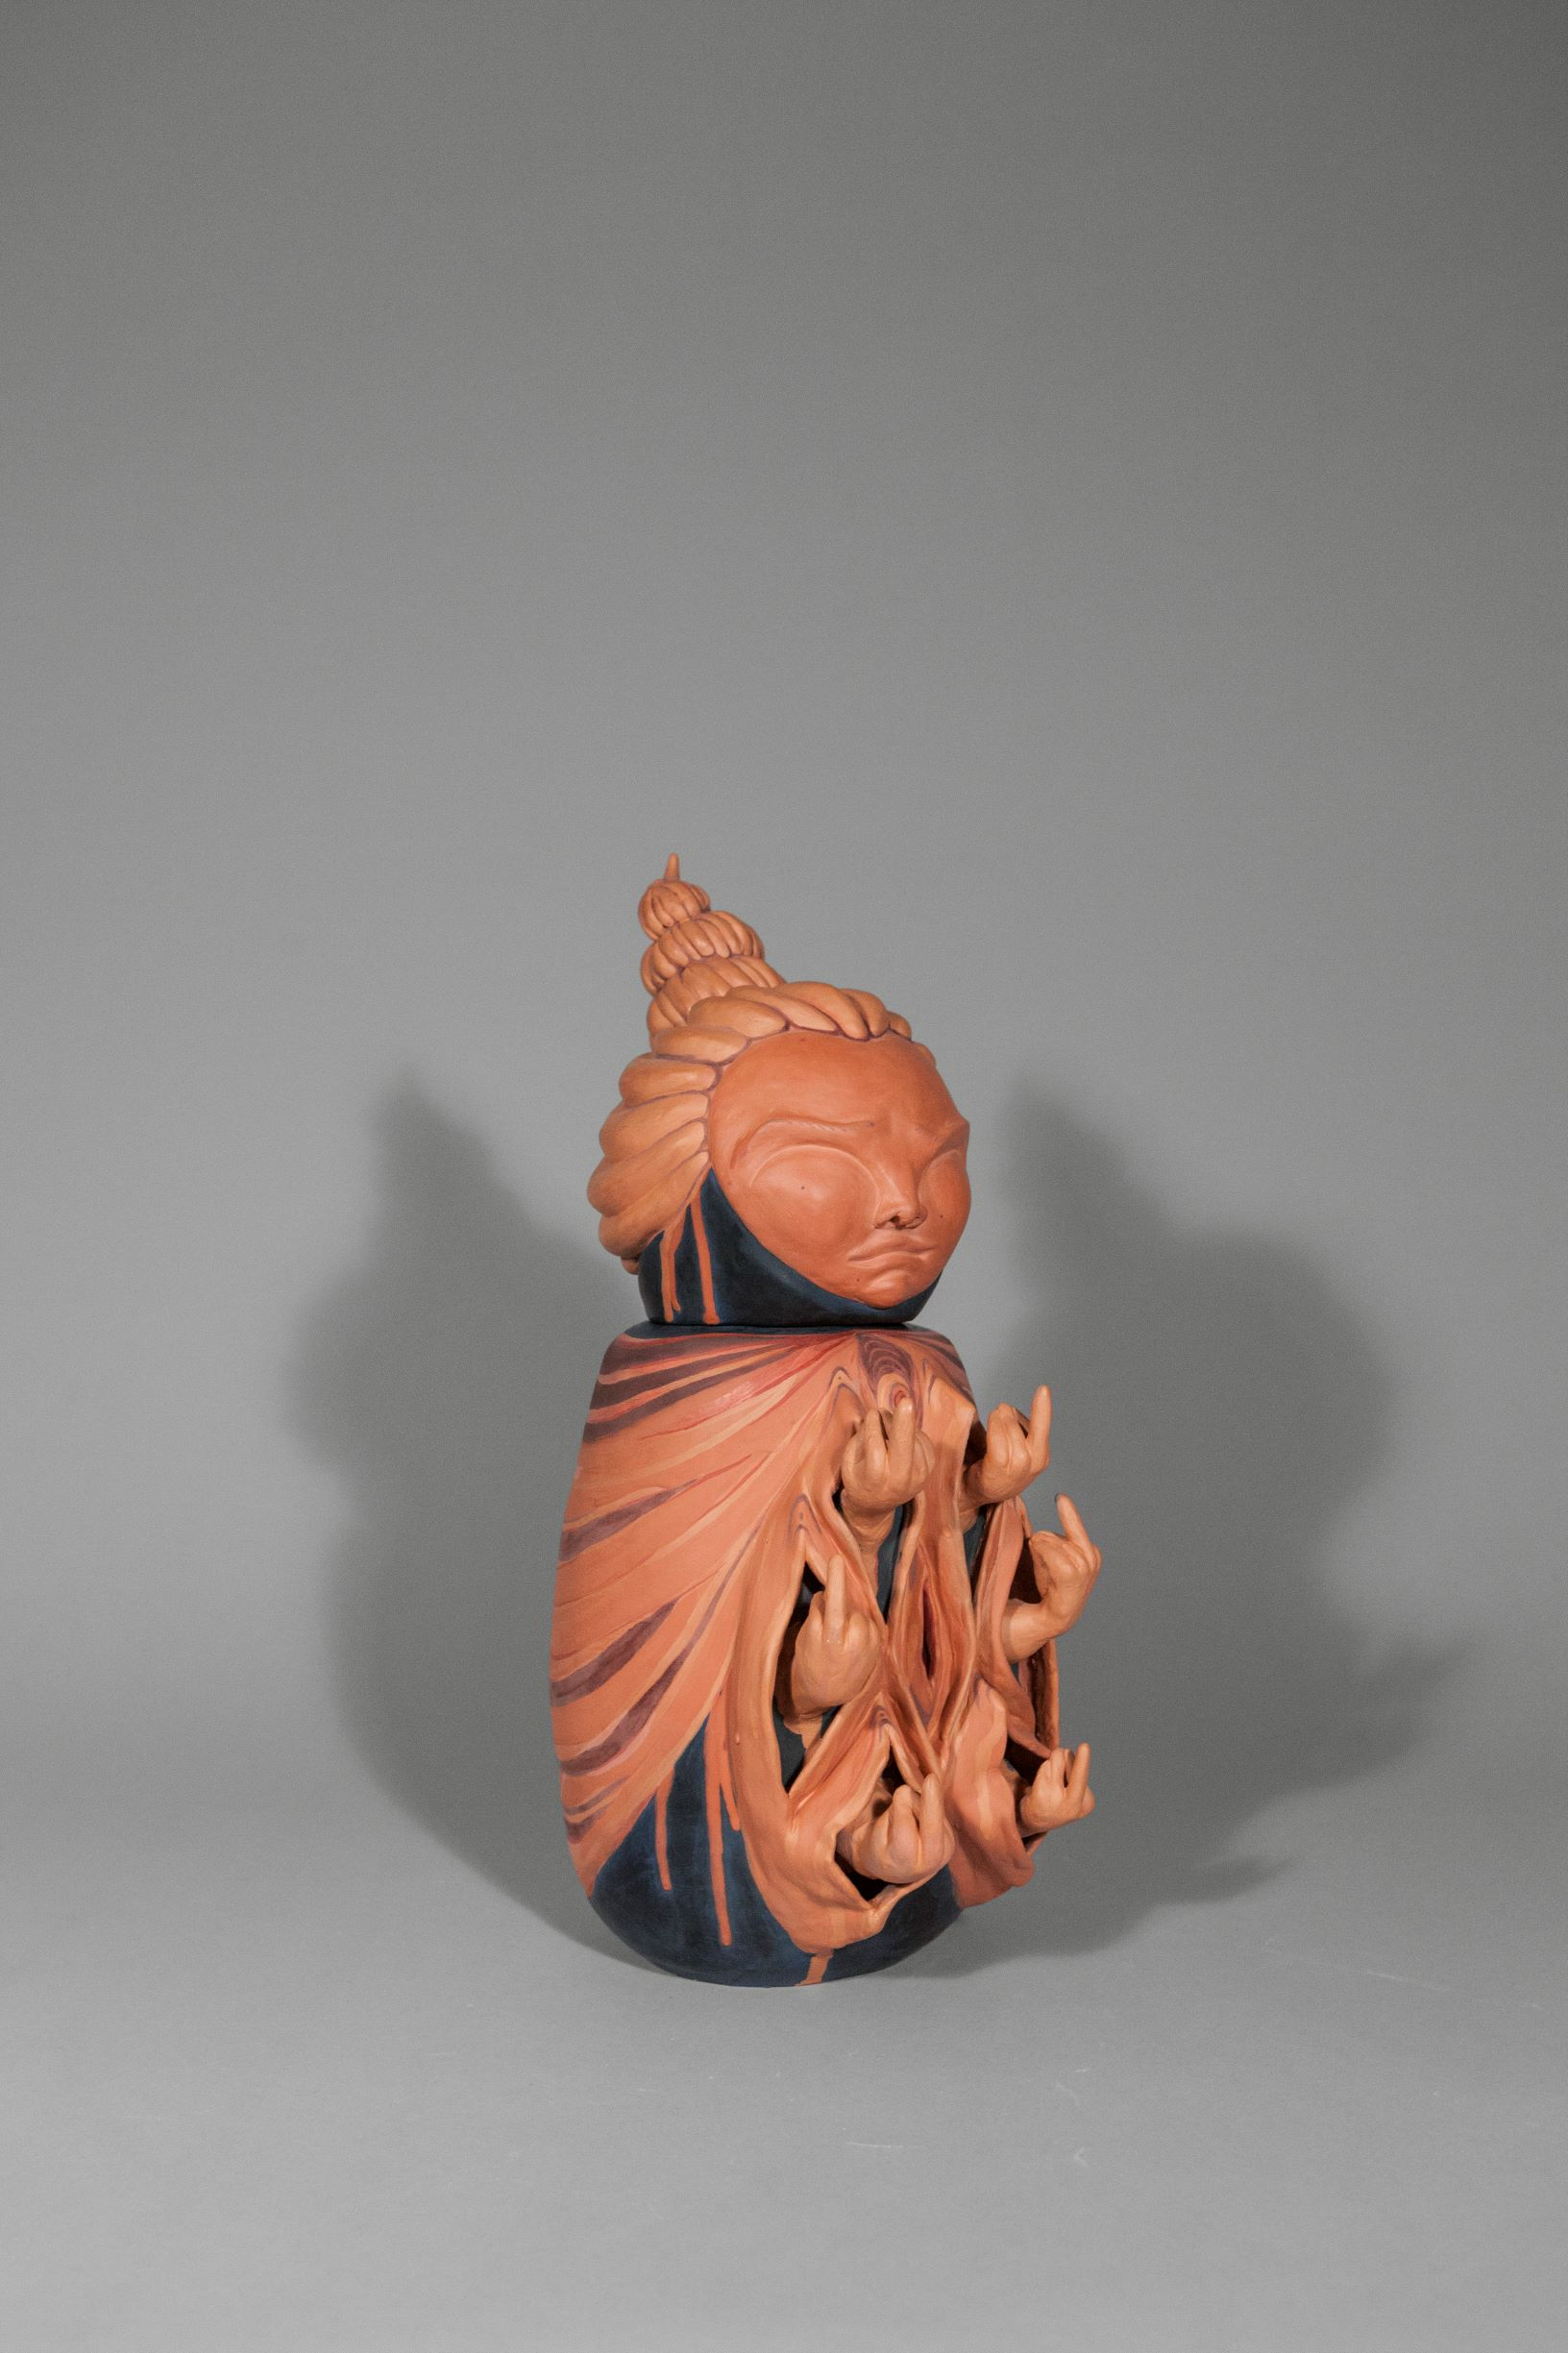 Venus Jar 1 (detail)